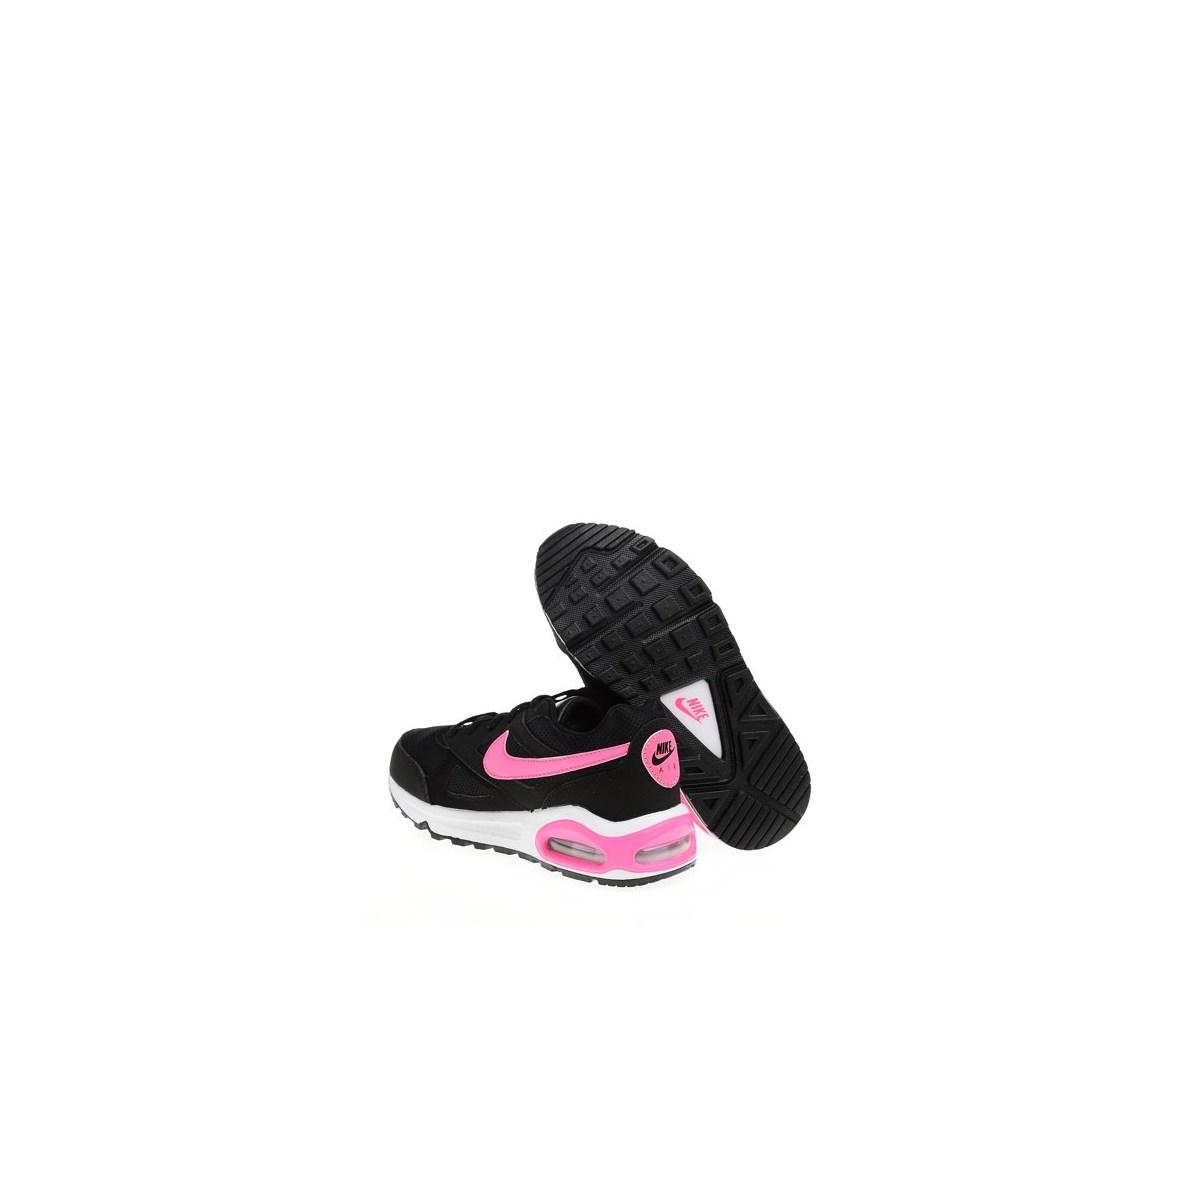 Air Max İvo Siyah Pembe Spor Ayakkabı